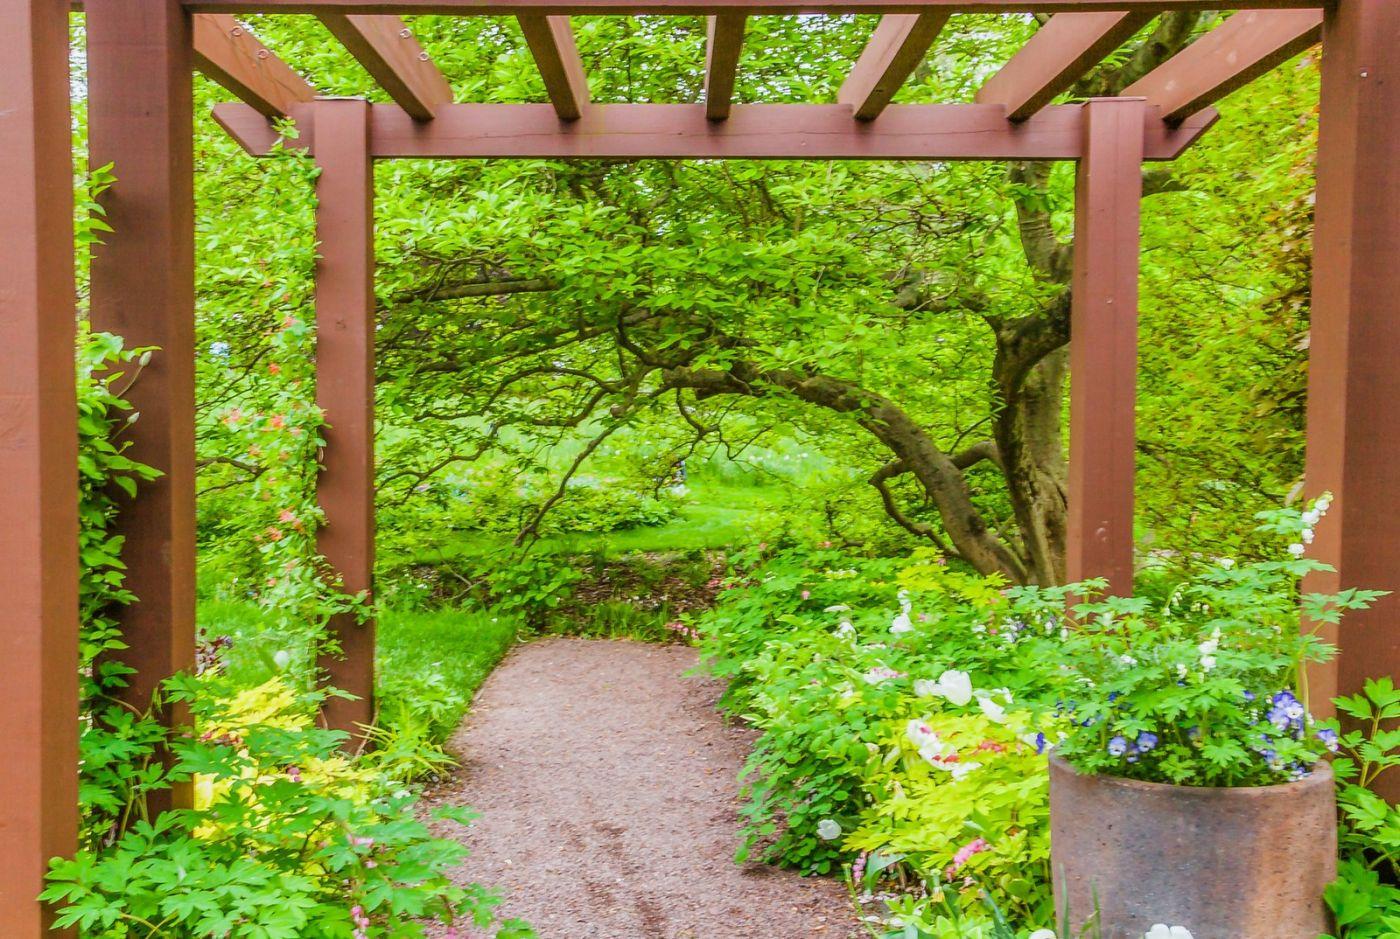 Chanticleer花园,一步一景_图1-38